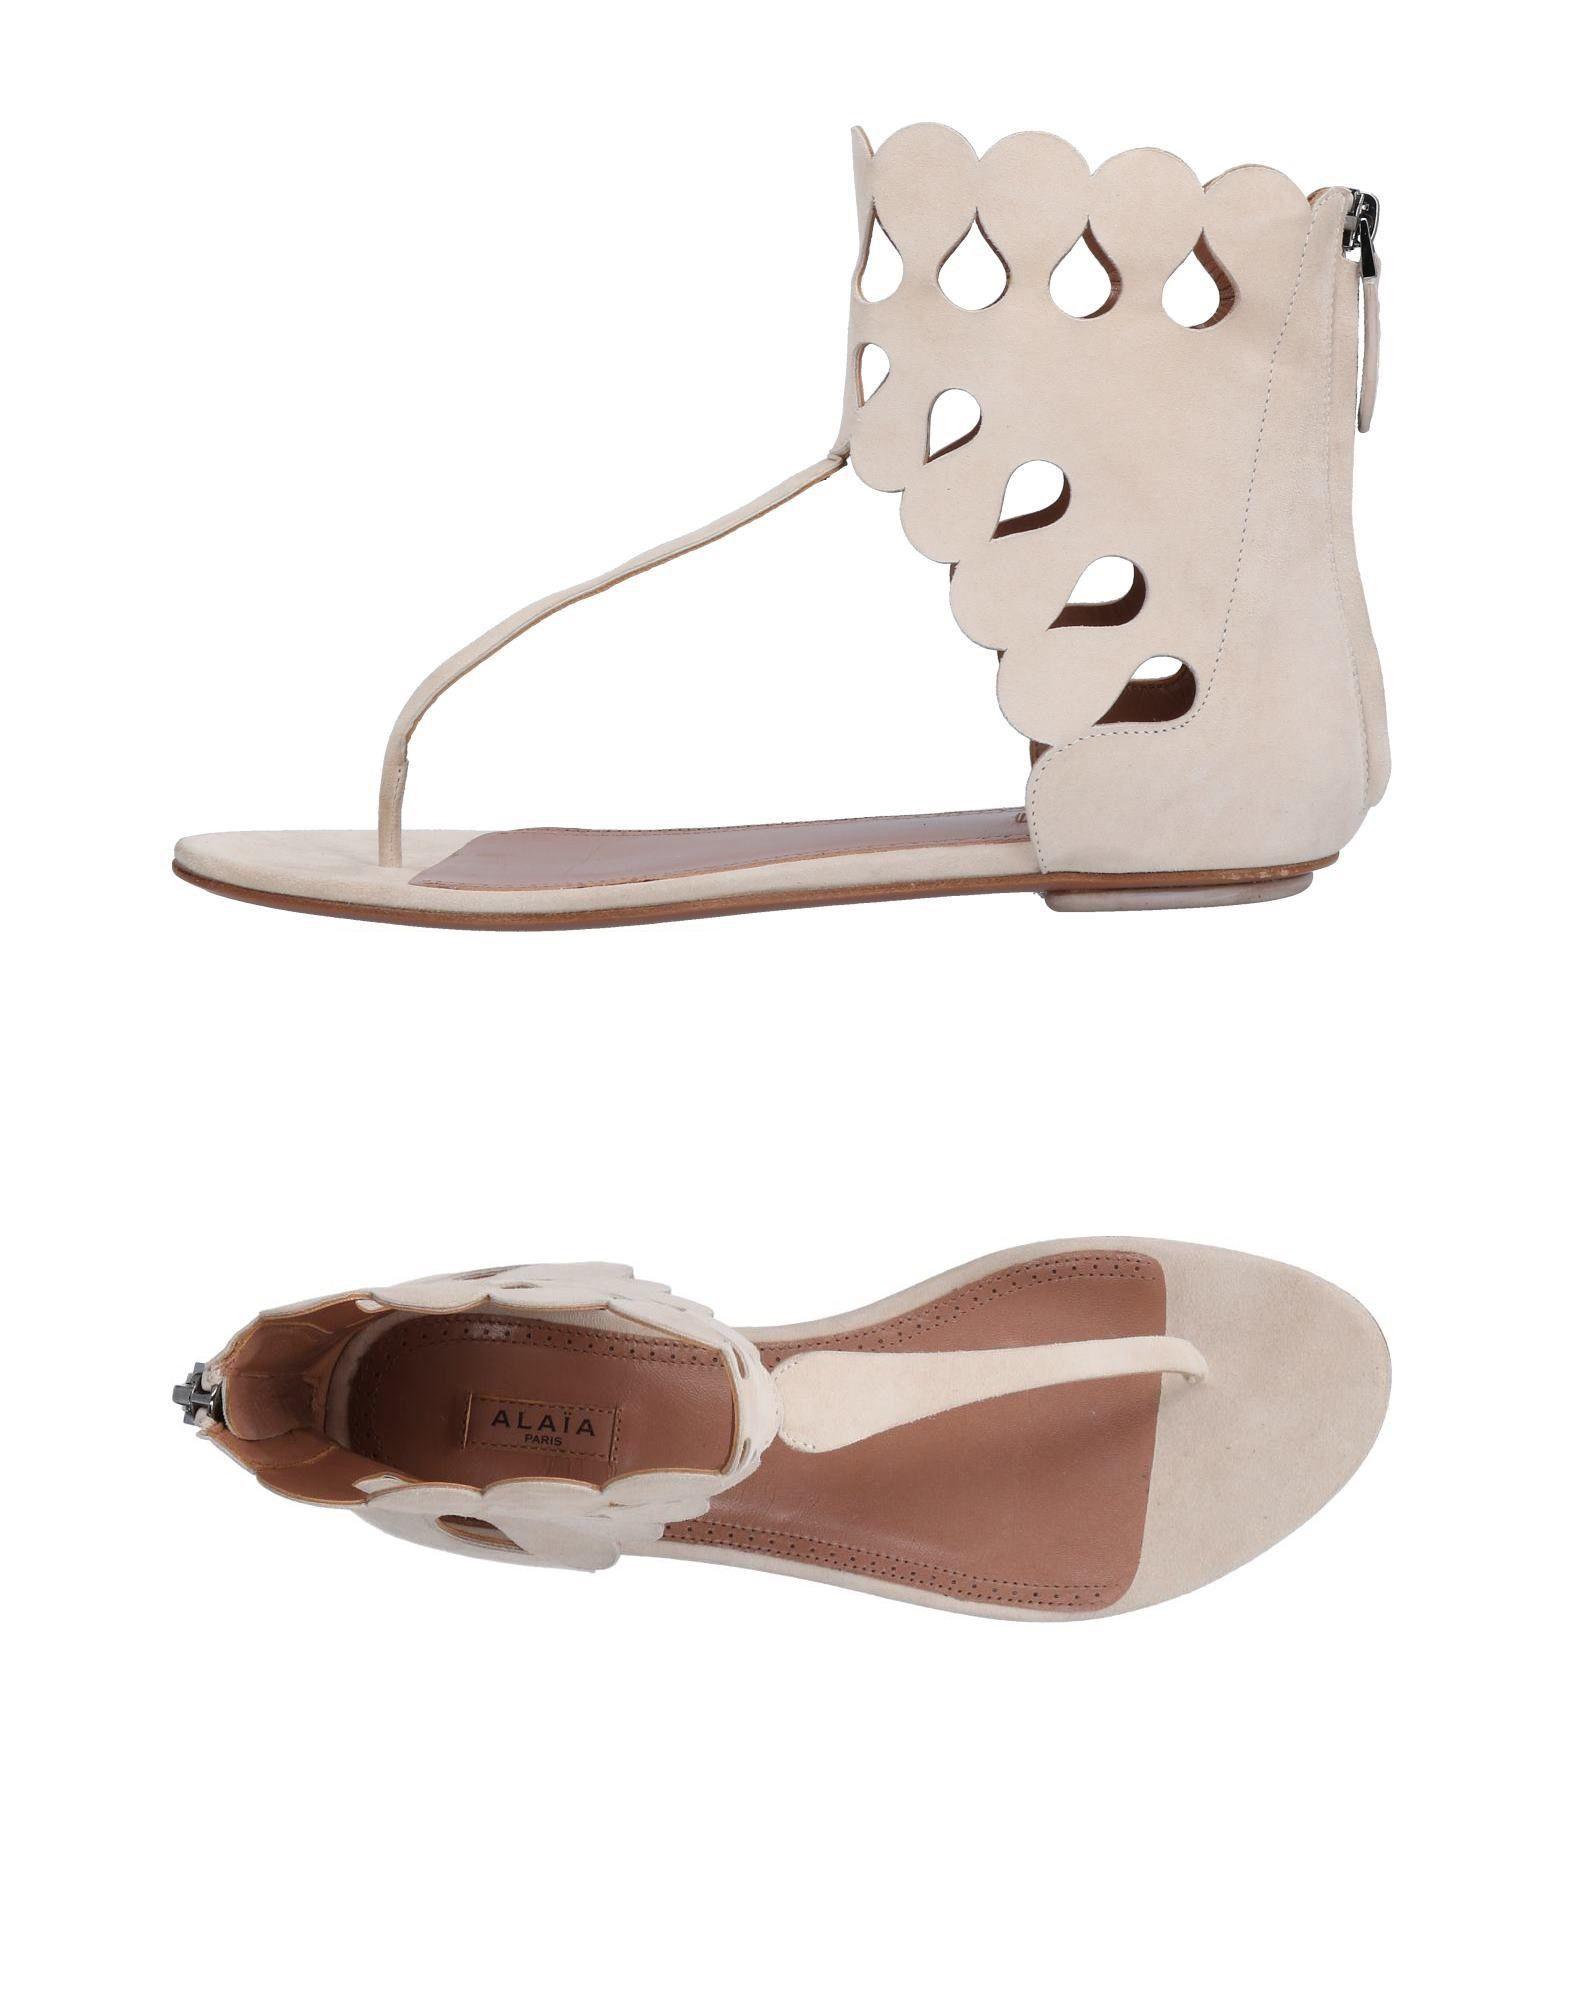 Alaïa Alaïa Flip Flops - Women Alaïa Alaïa Flip Flops online on  United Kingdom - 11503425JT 95dd3c